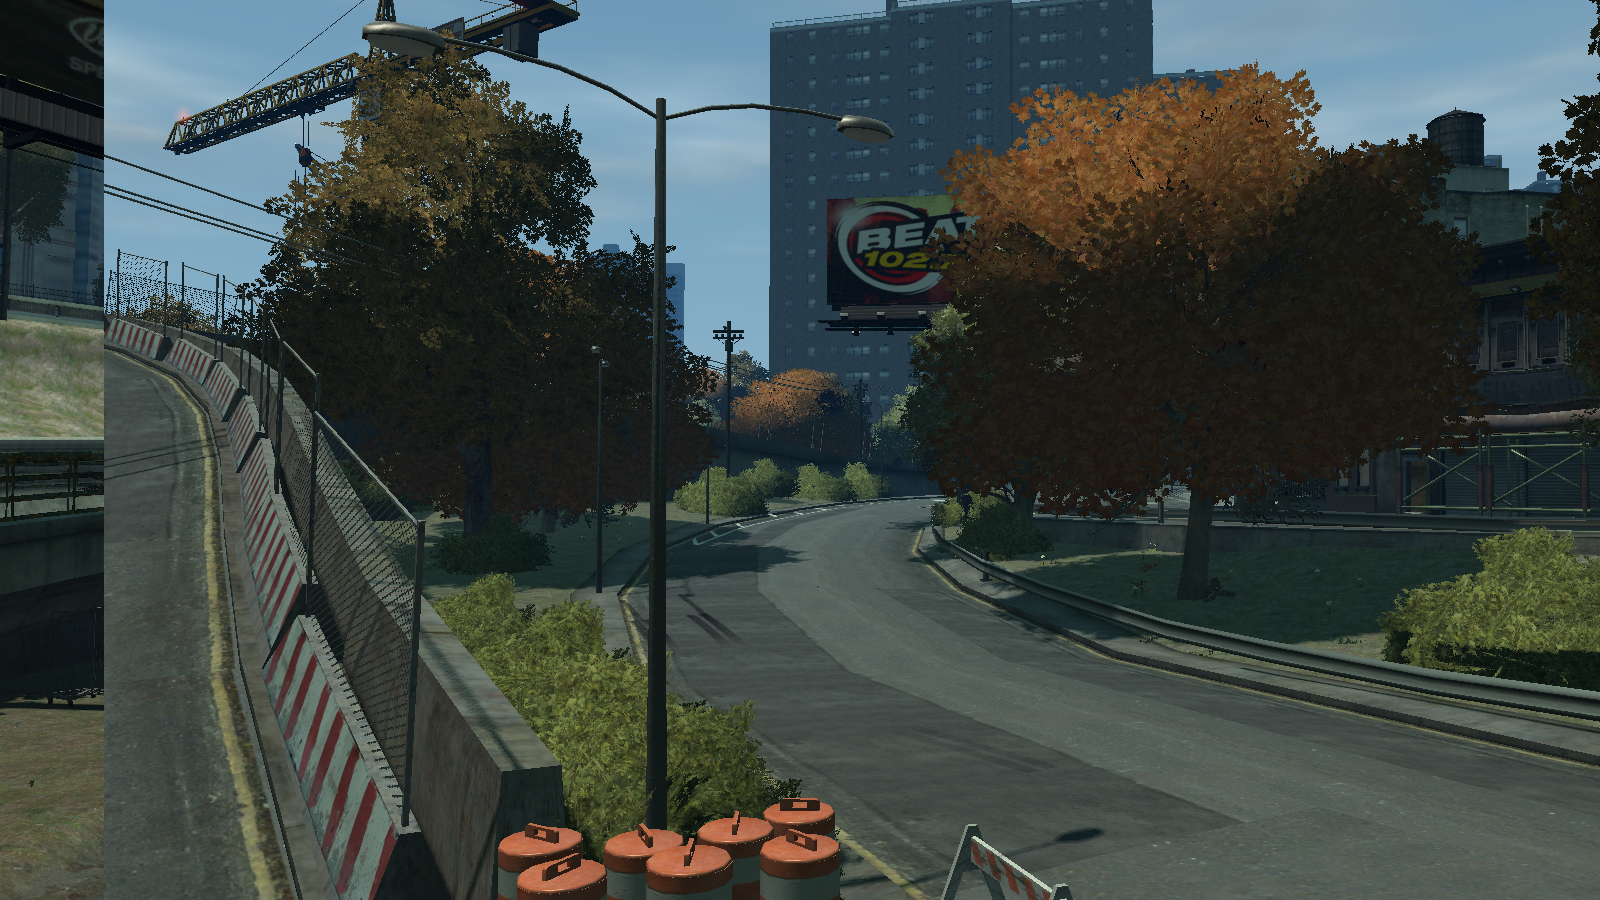 Gainer Street